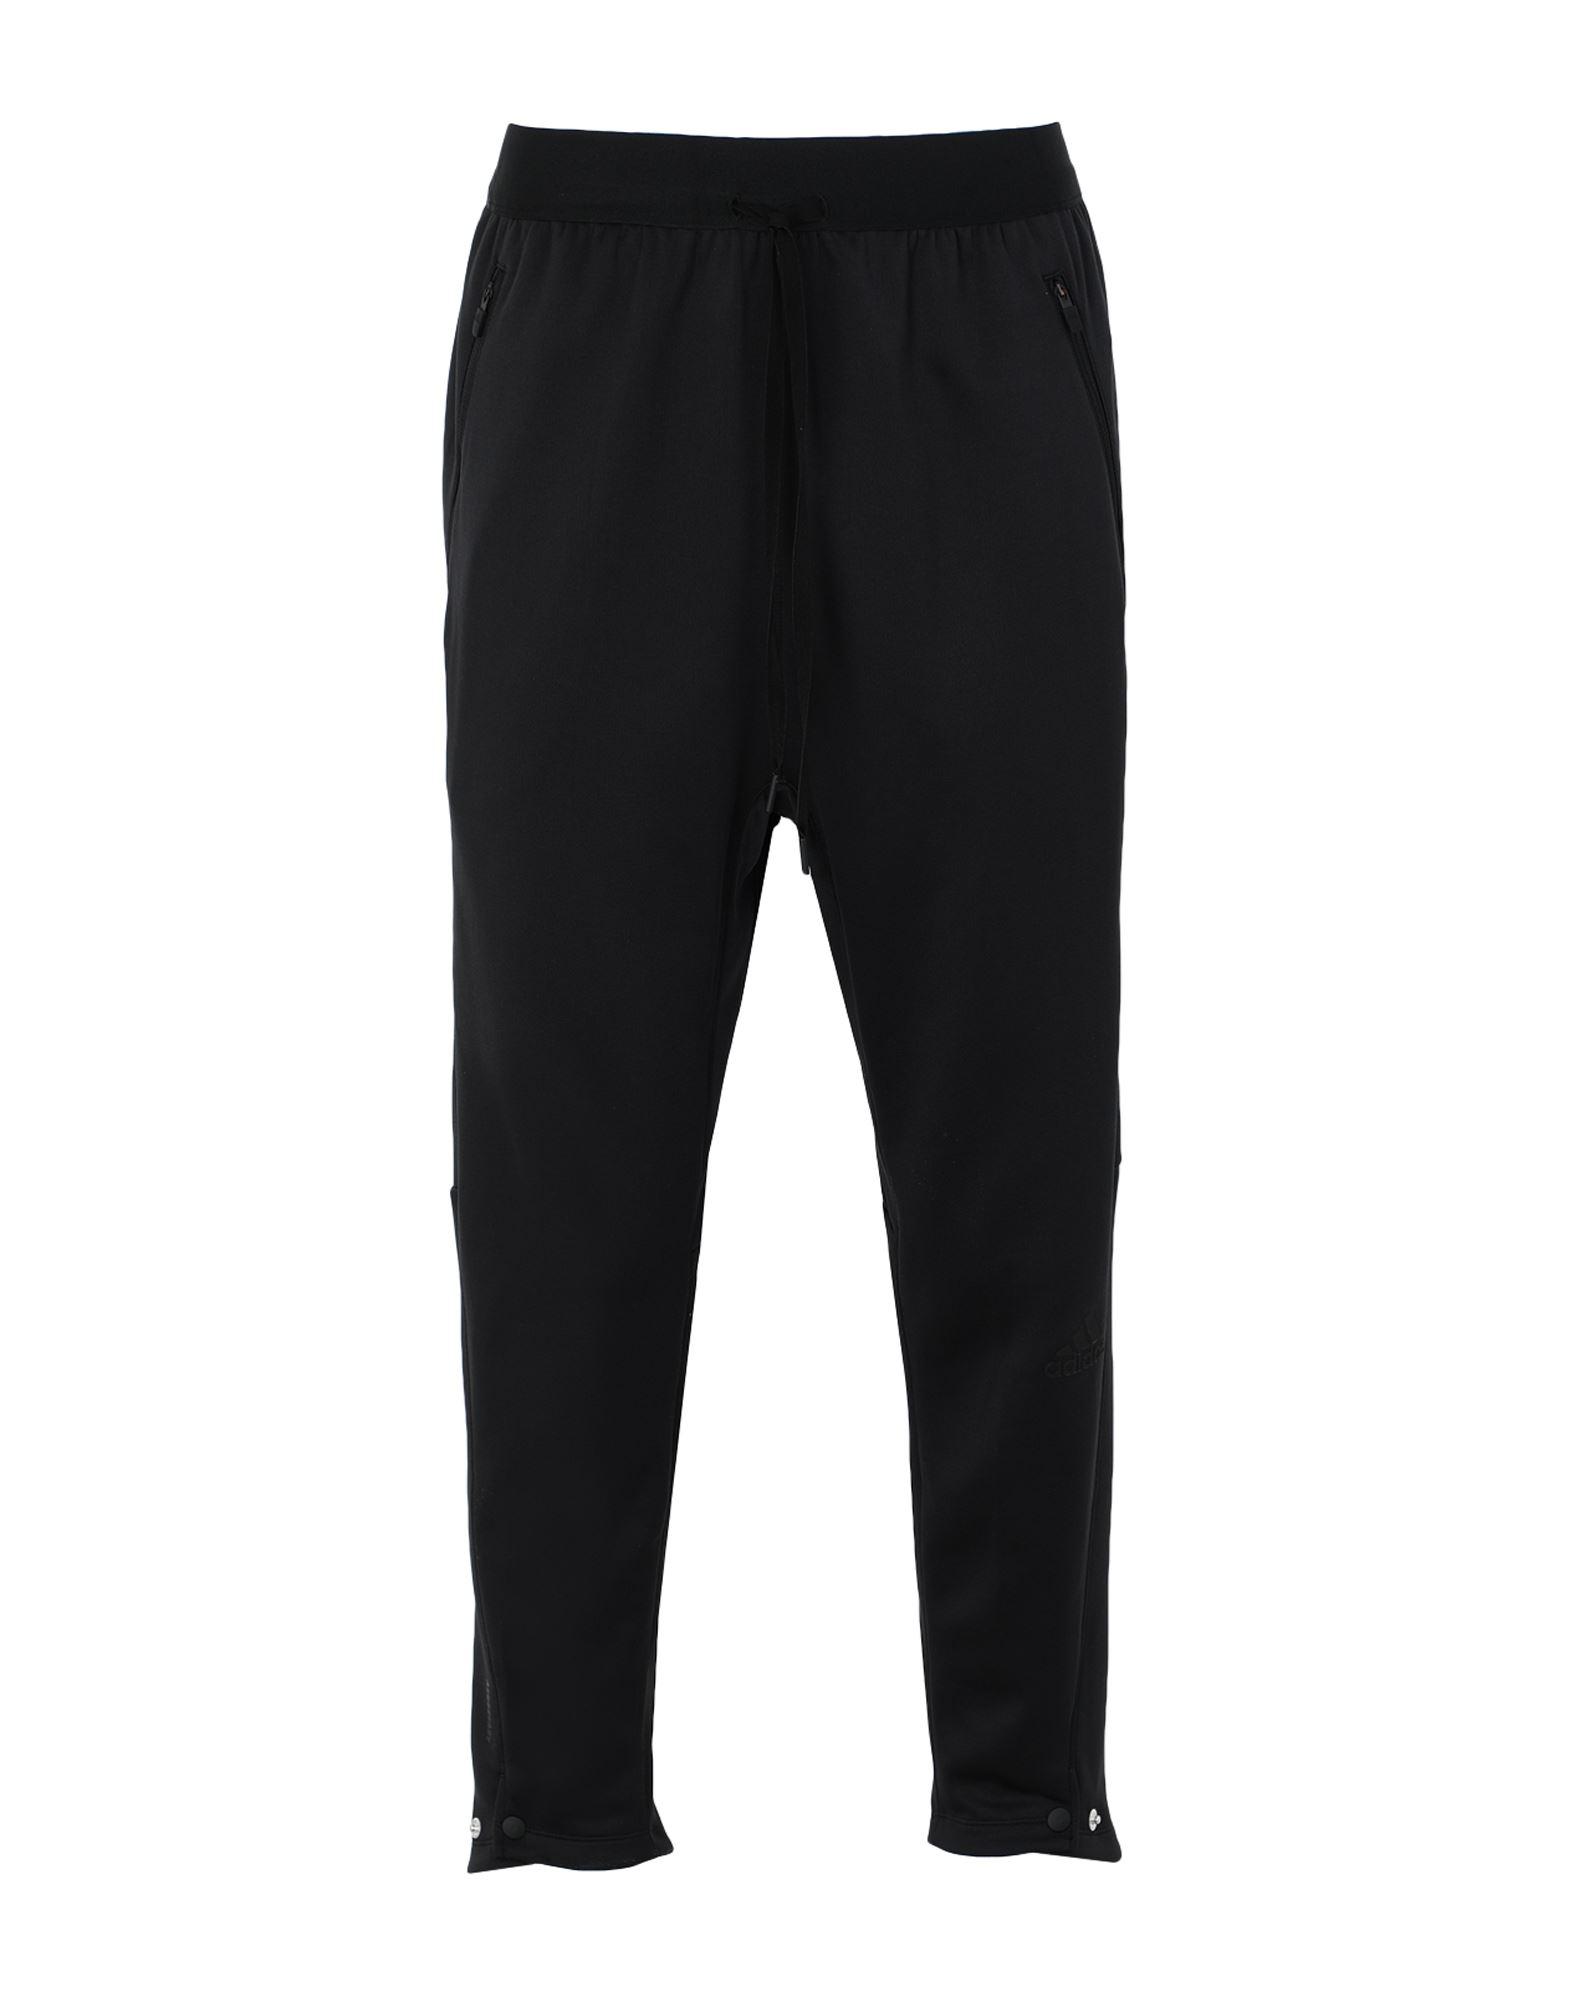 Adidas Originals Linings CASUAL PANTS